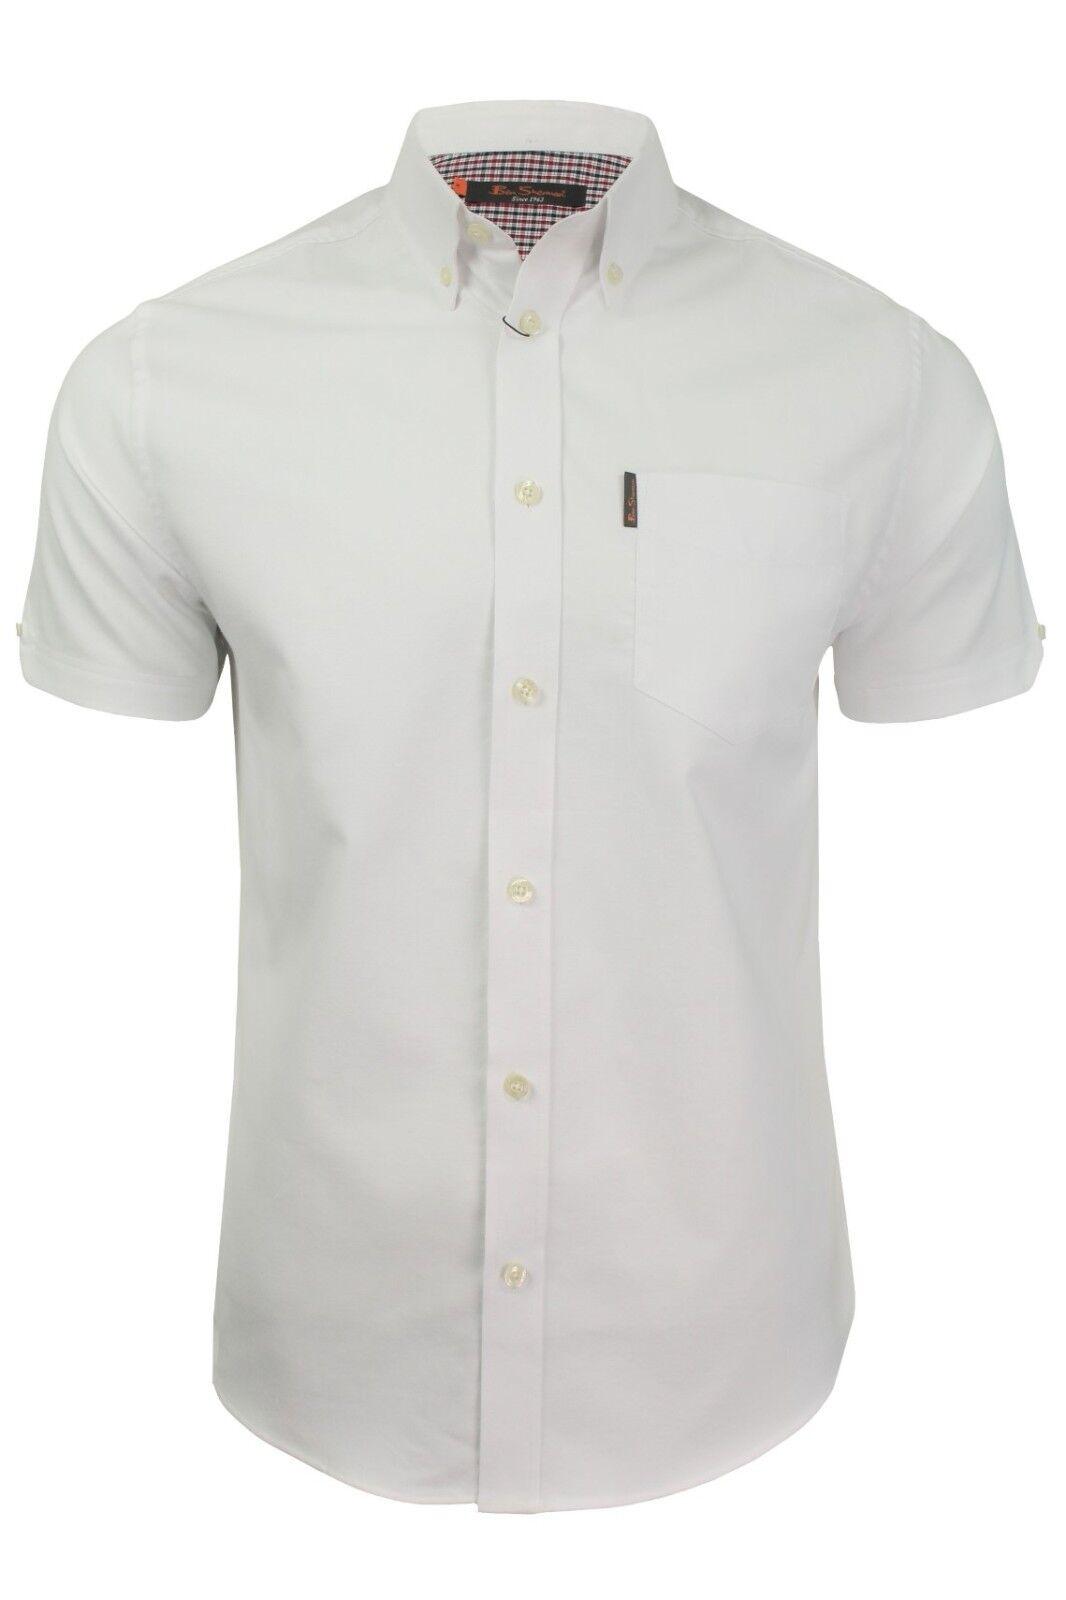 Mens Ben Sherman Classic Cotton Short Sleeve Oxford Shirt 48580 - White